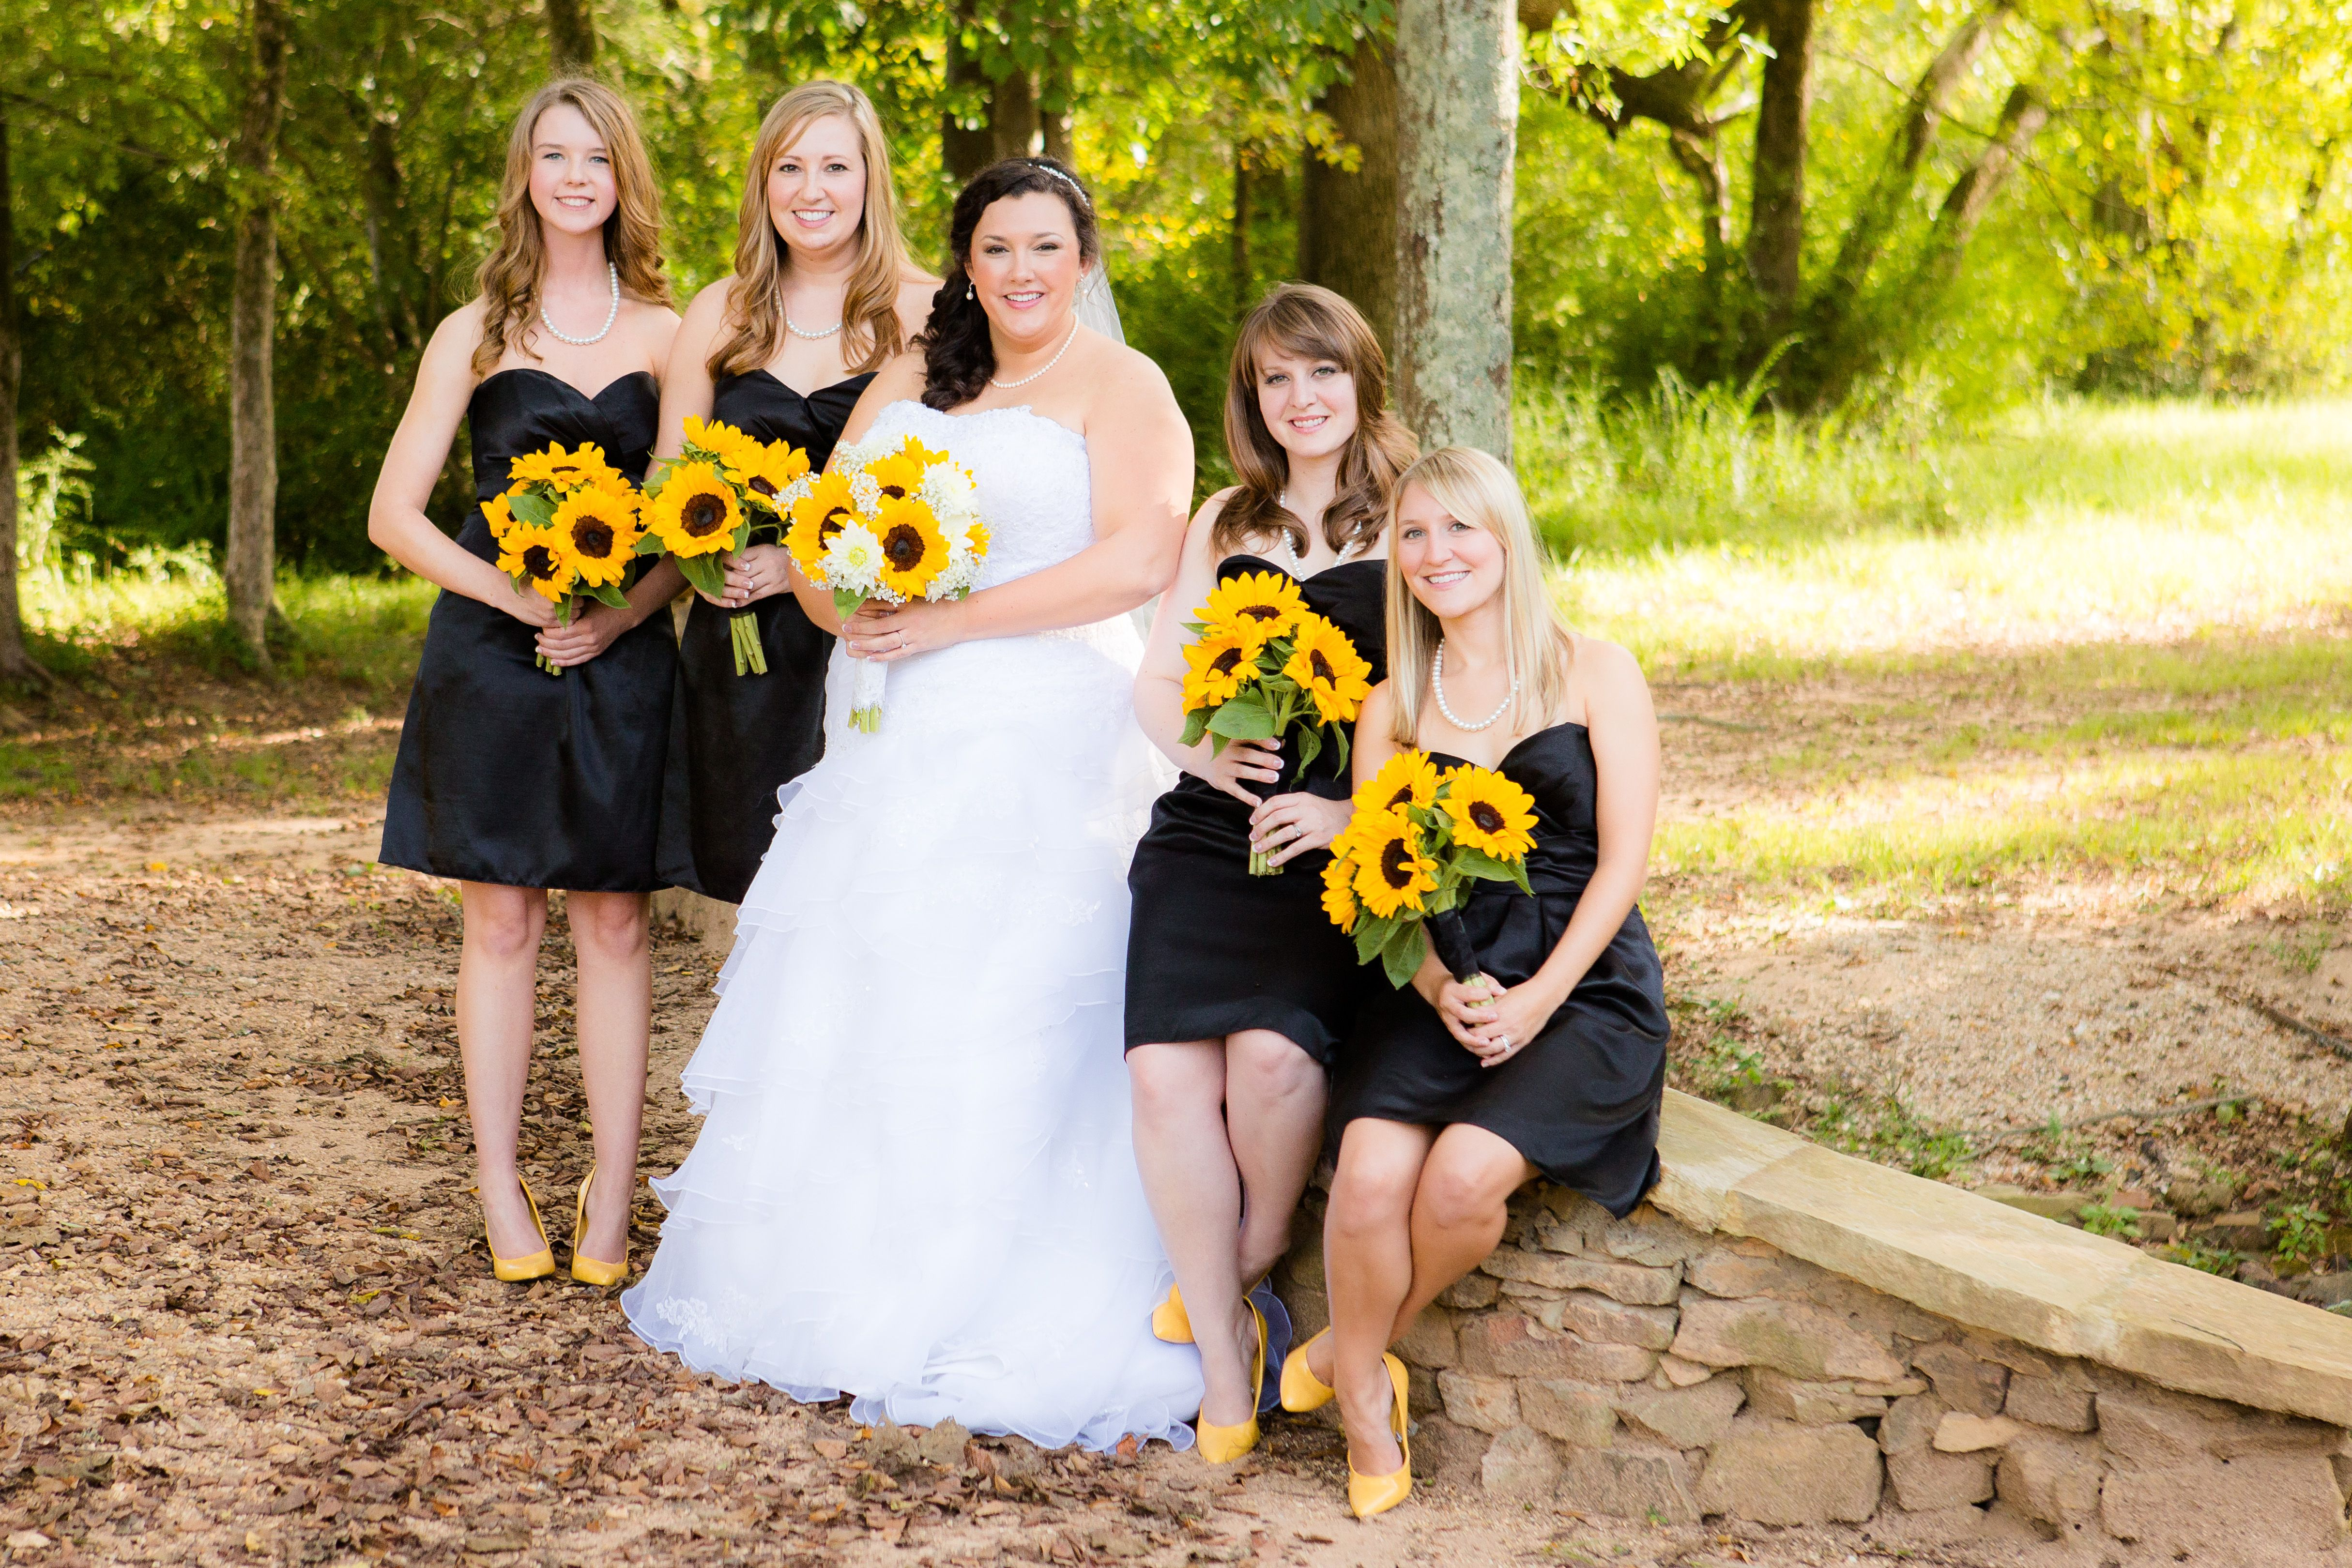 Short Black Bridesmaid Dresses Short Black Bridesmaid Dresses Black Bridesmaid Dresses Yellow Bridesmaid Dresses